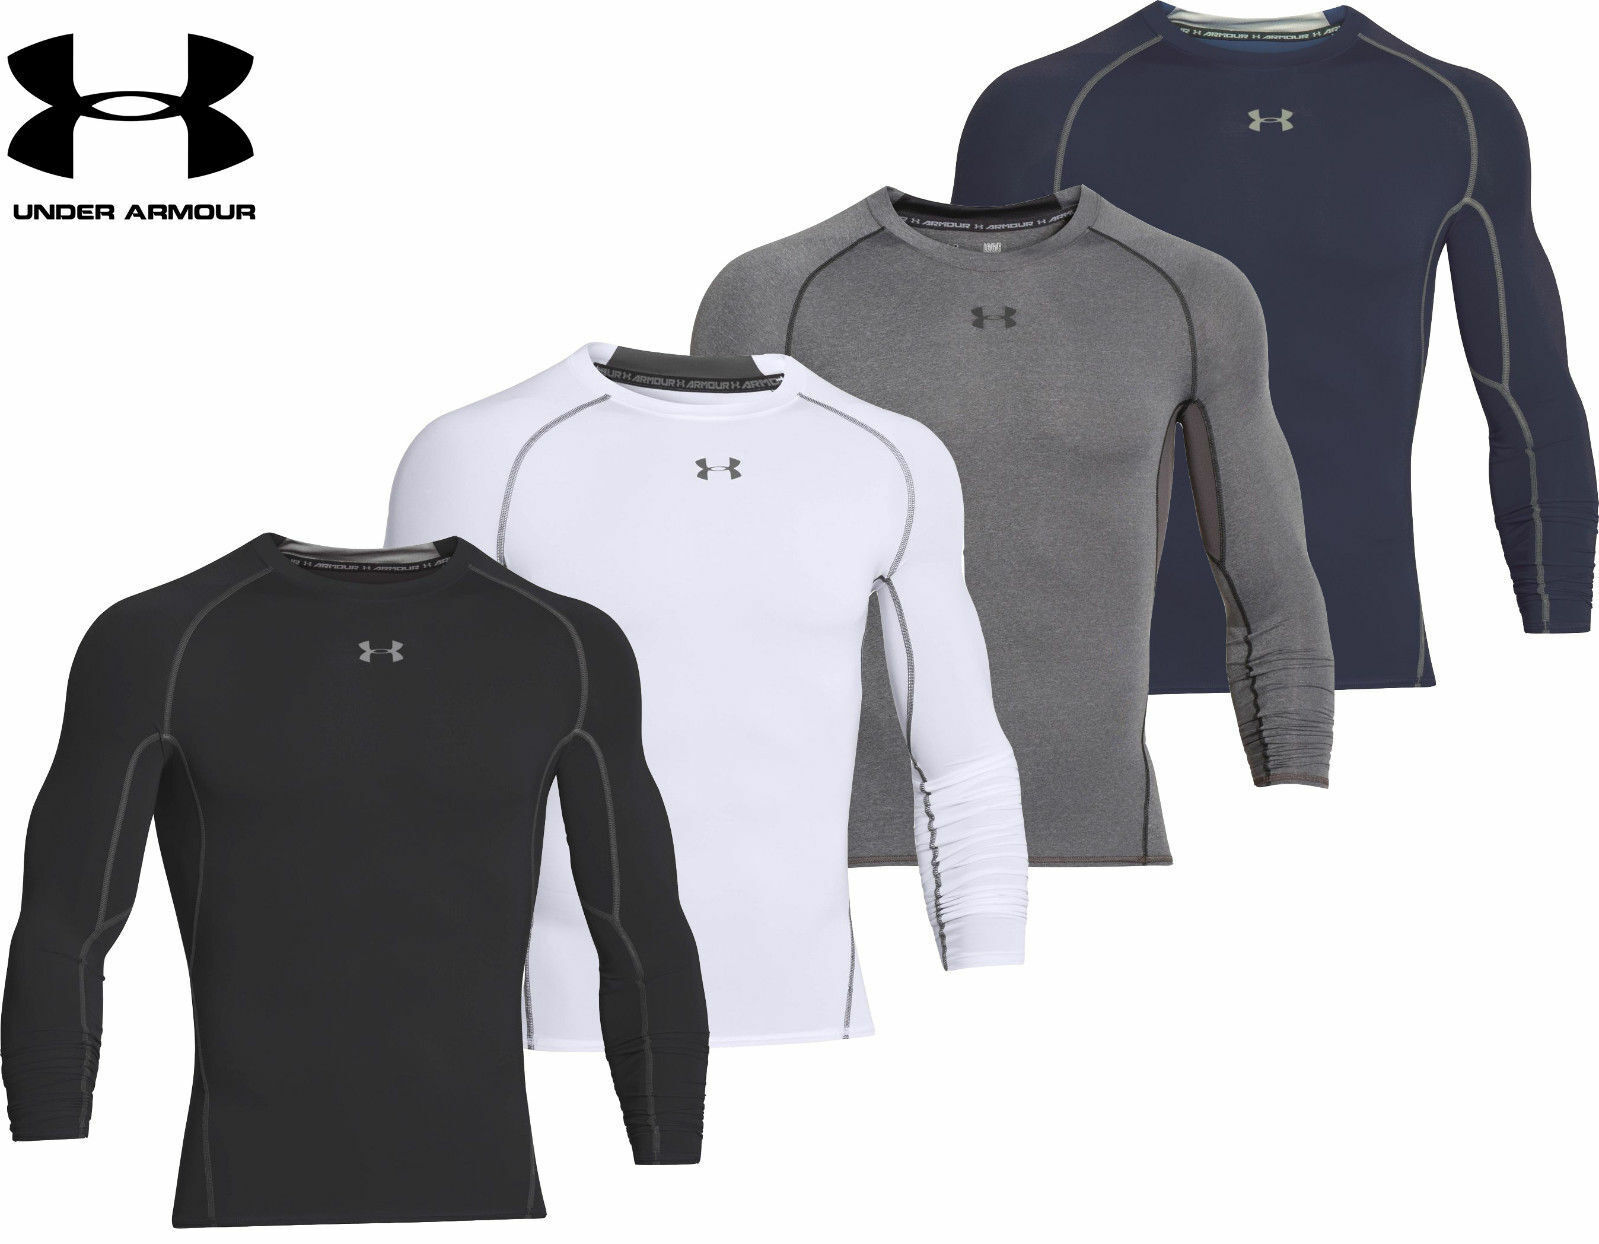 Under Armour UA Men's HeatGear Compression Shirt  - FREE SHI